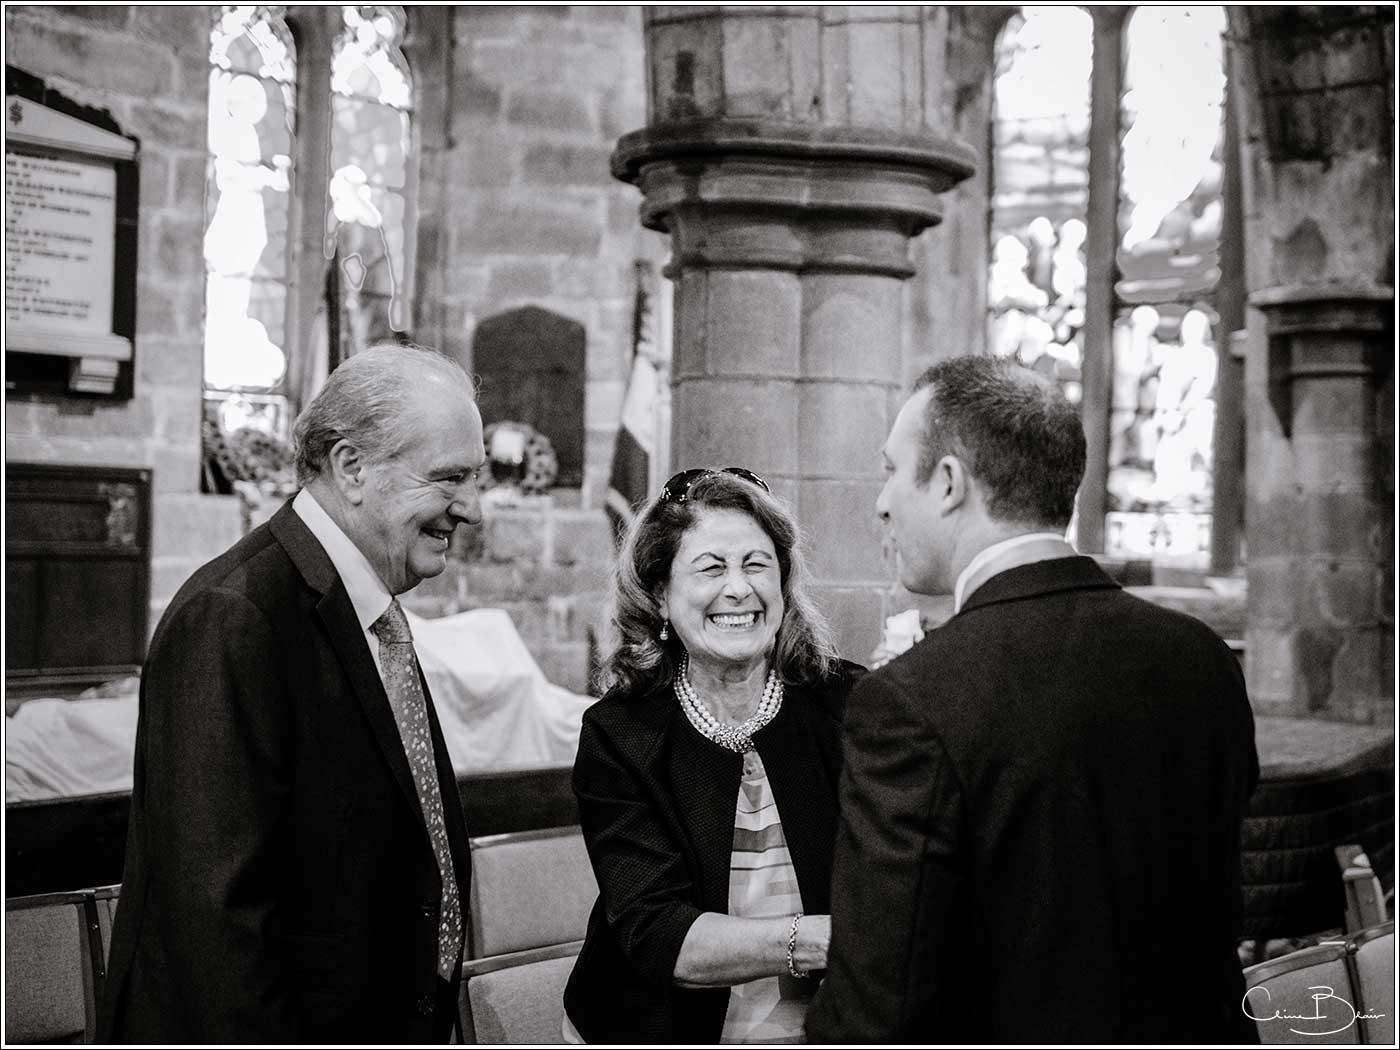 Wedding guests greeting groom: Bank House Wedding Photographer Clive Blair Photography. Documentary Birmingham Wedding Photographer